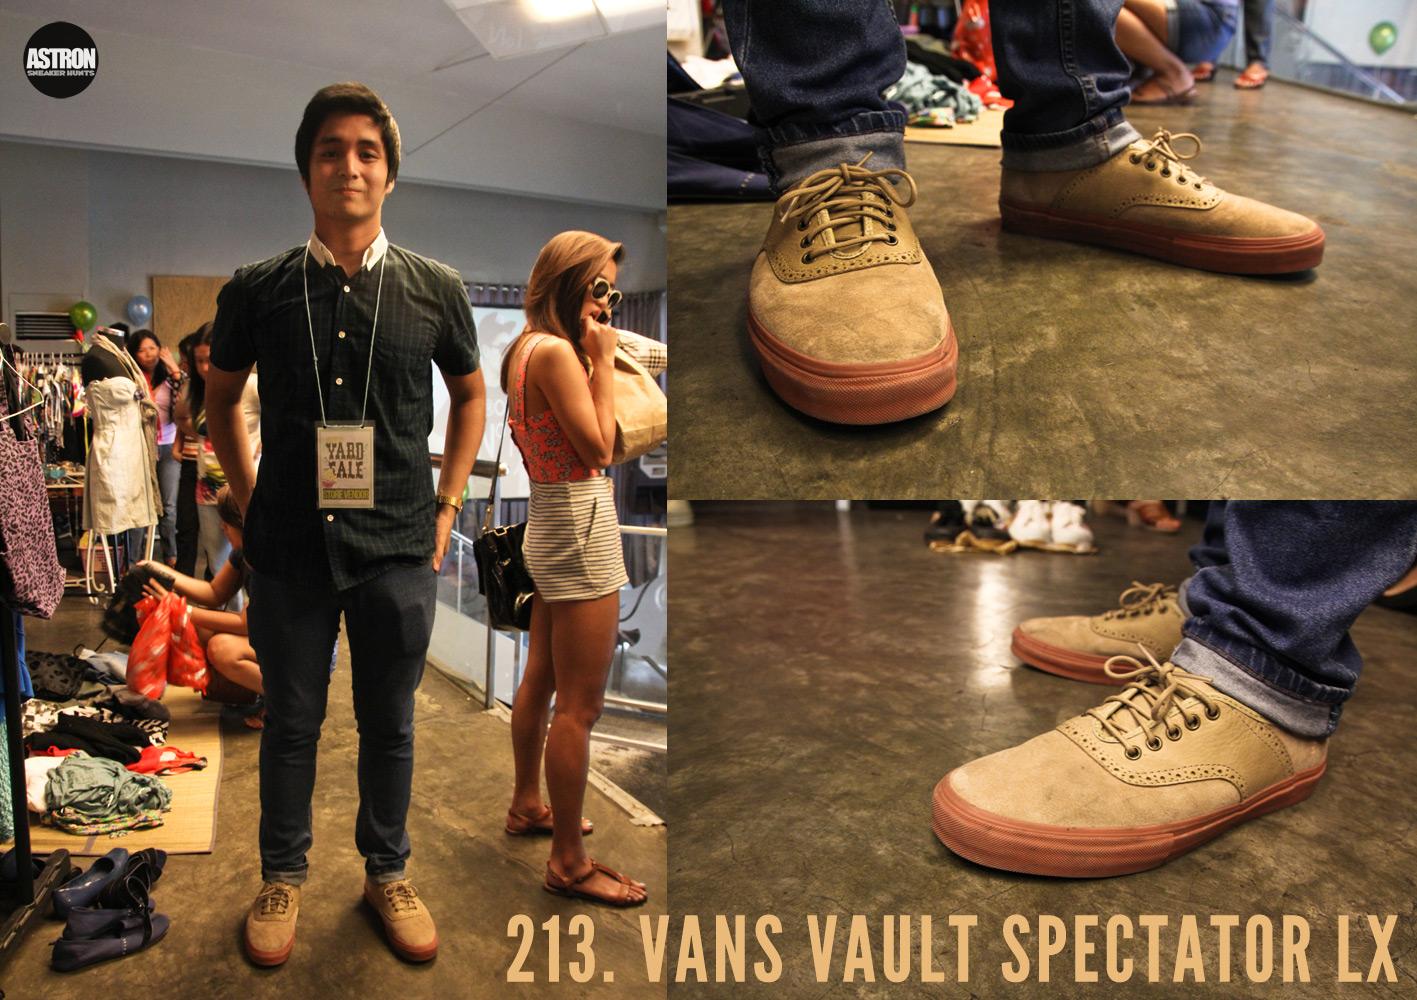 dabc51b355 Astron Sneaker Hunts  213. Vans Vault Spectator LX